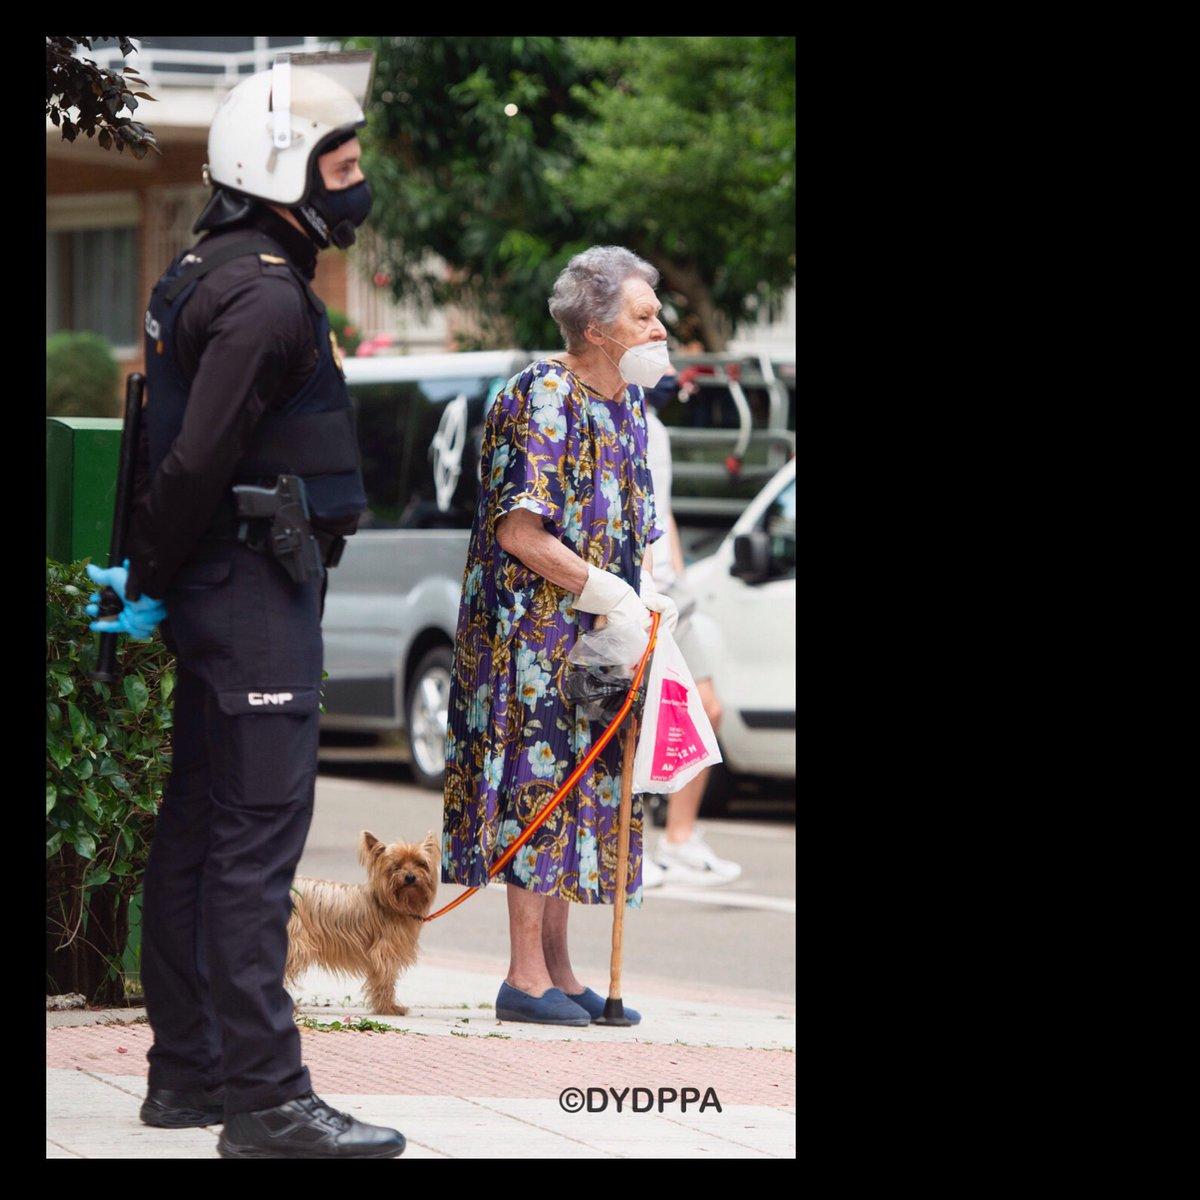 Thank's to all people who fight against Covid-19. #riotpolice.#fuerzasdeseguridad #cnp #yomequedoencasa #stayathome #madrid #mascarillas #streetphotography #dydppa #spain #coronavirus #covid #covidー19 #mujeres #StayHome #abuela #policianacional #street #perro #mascotaspic.twitter.com/9RLsfMX8Vx